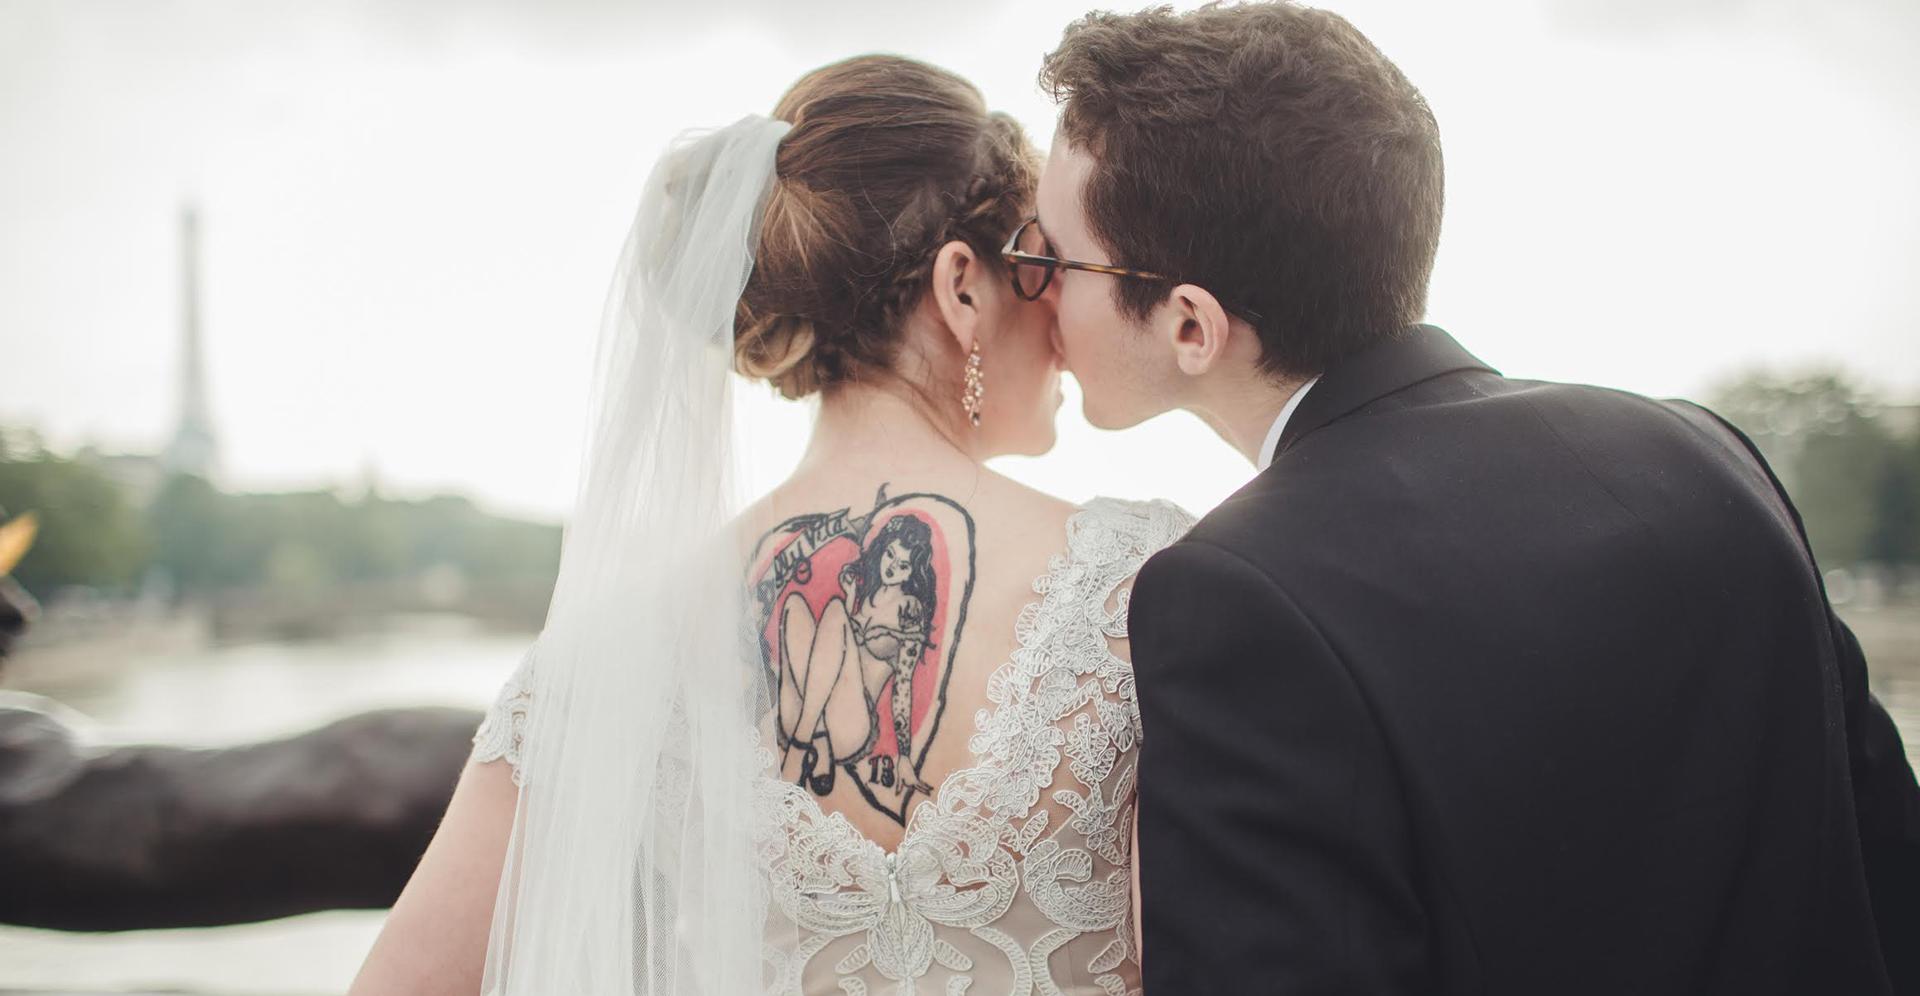 Love Gracefully ceremonies